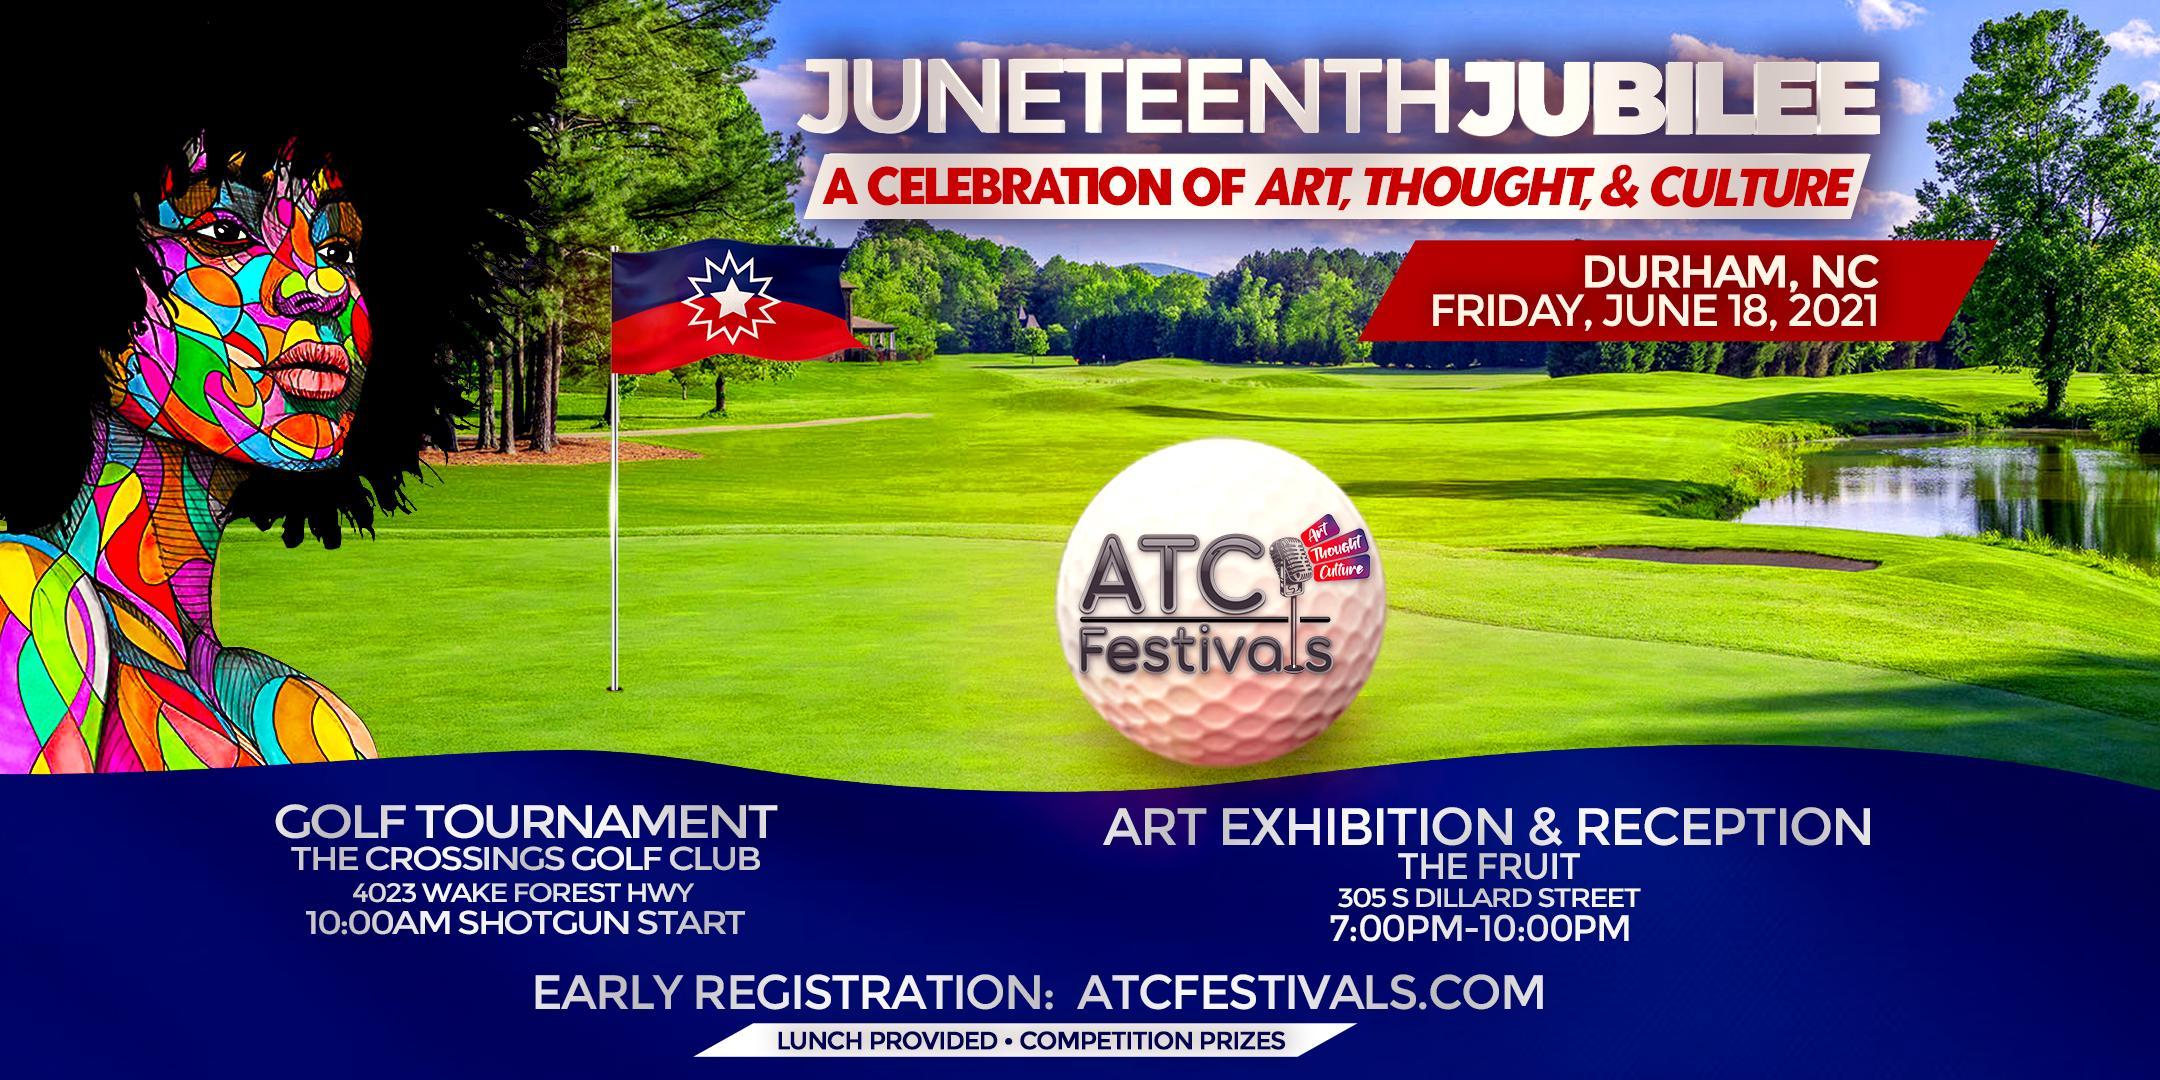 Juneteenth Jubilee – Golf Tournament, Art Exhibition, and Reception